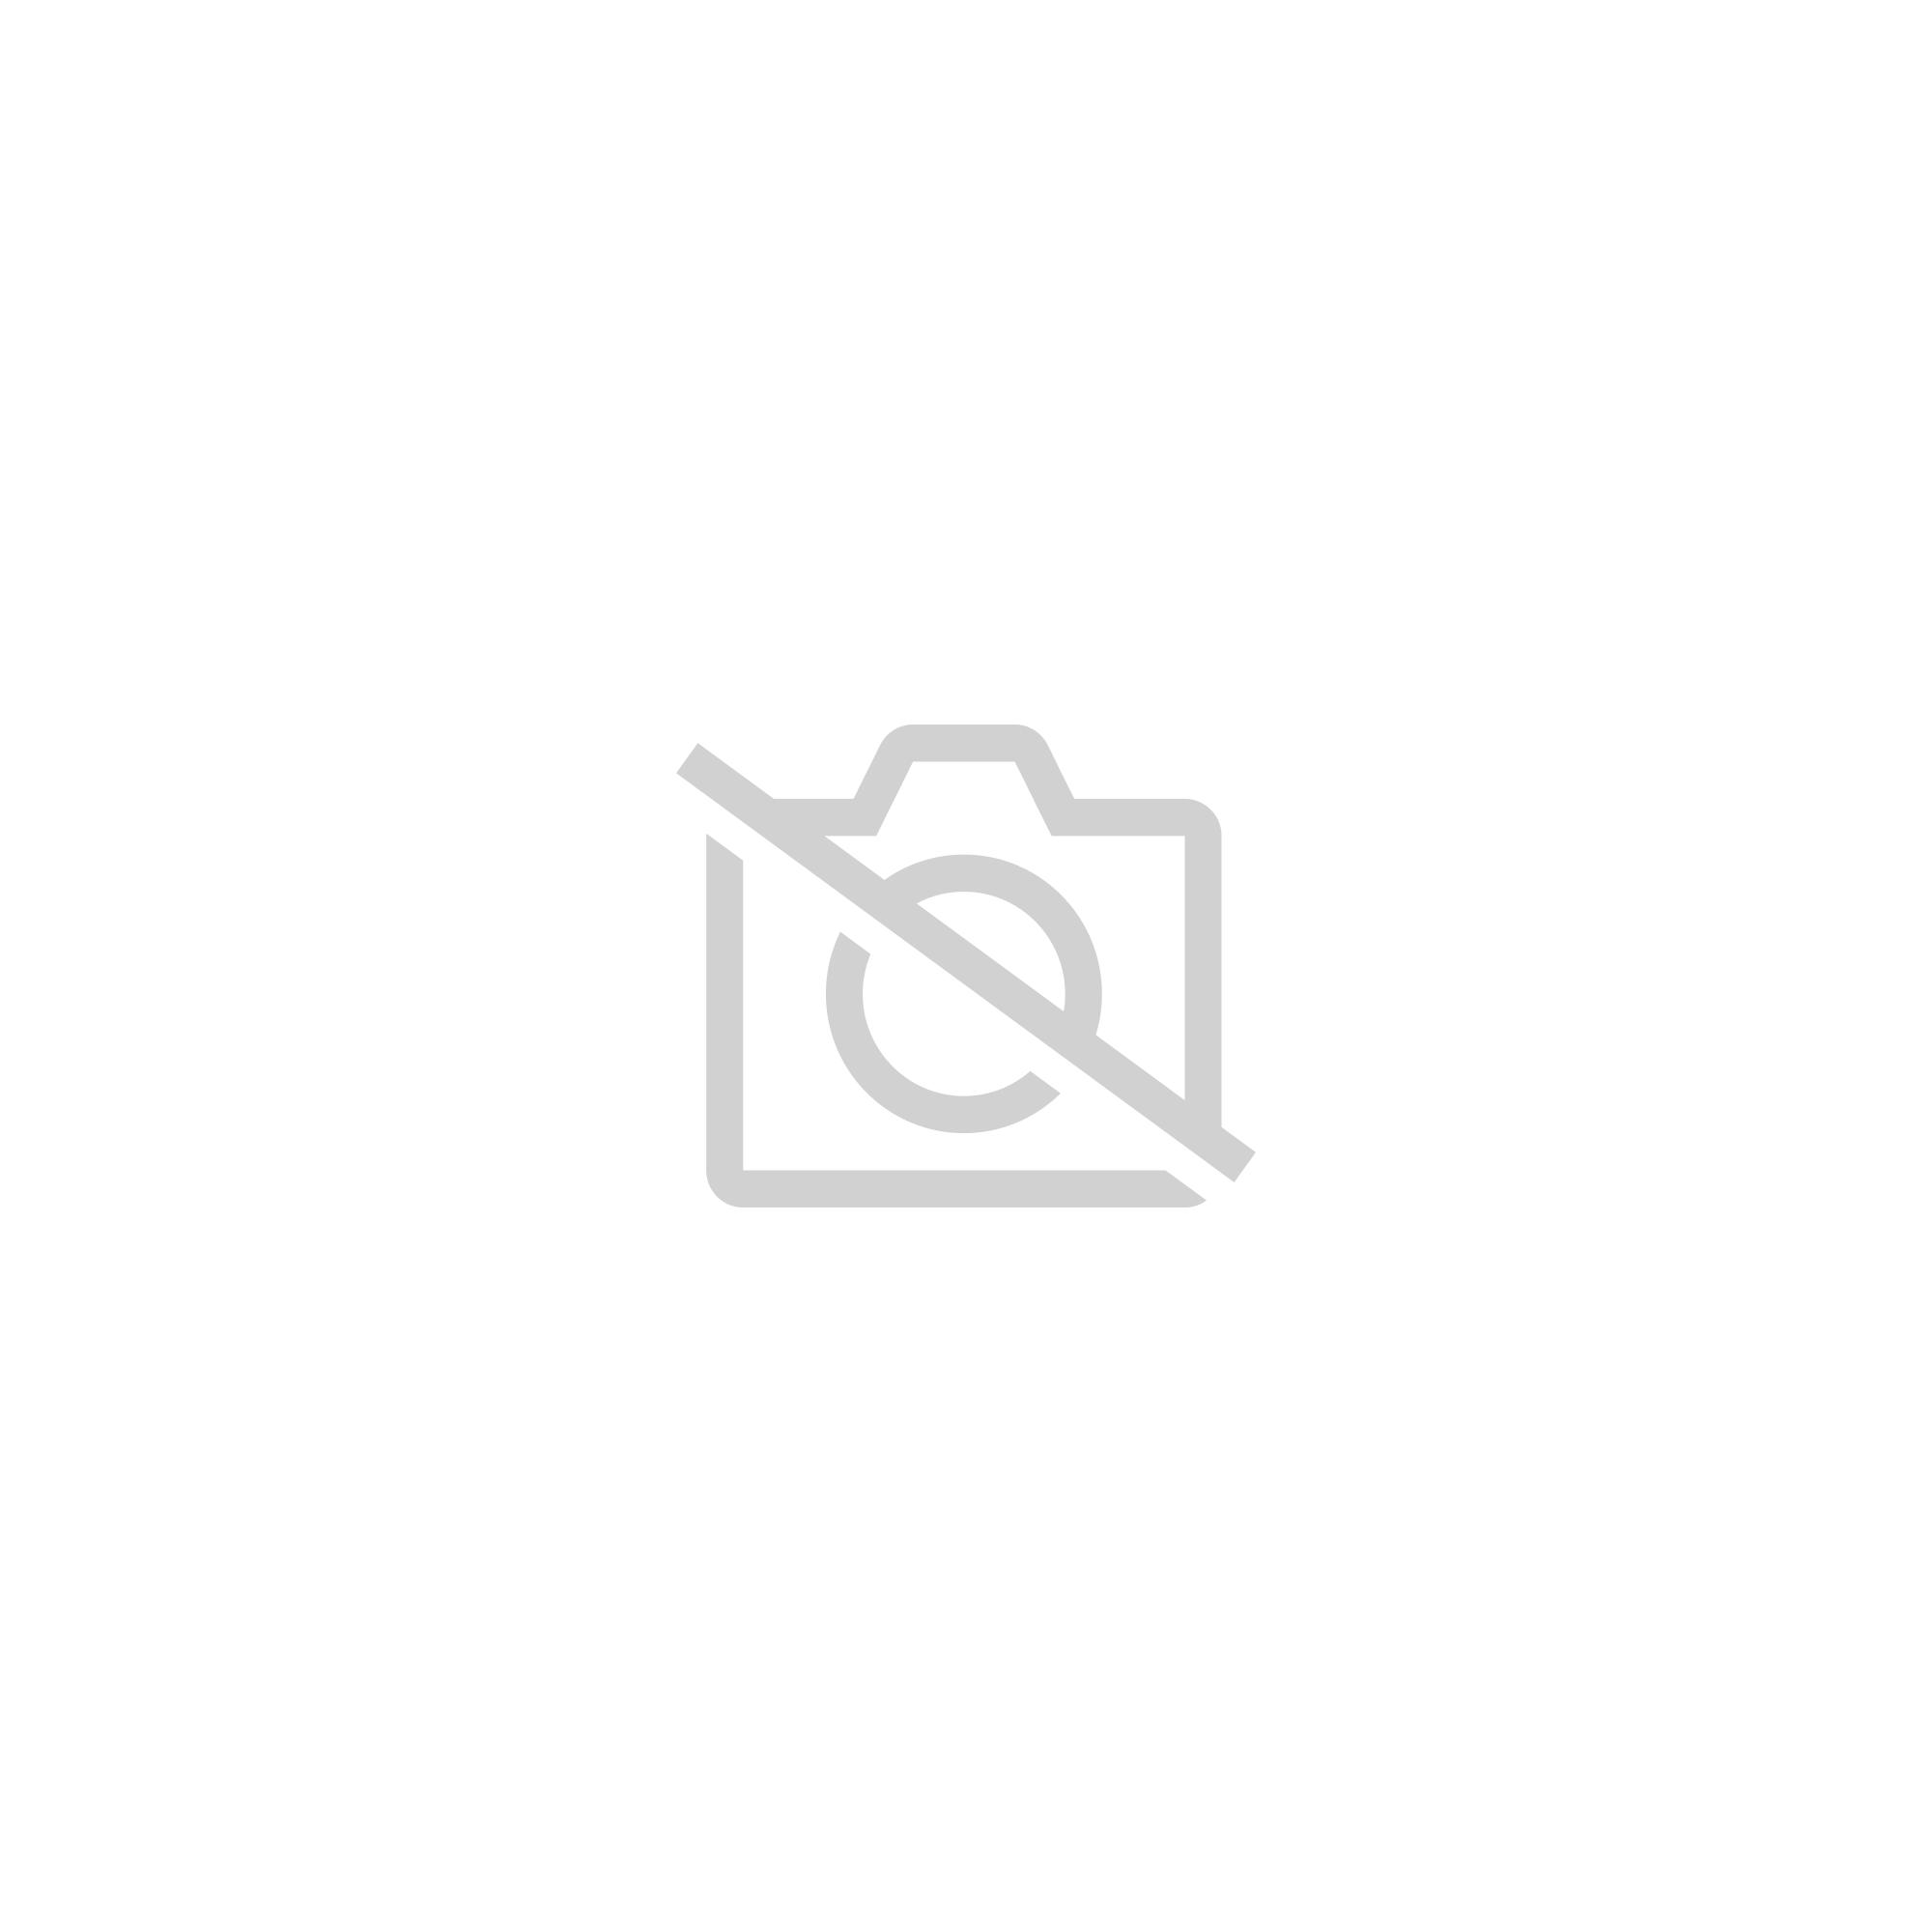 Drap Plat Blanc 100x150 Cm Futur Compos� 150x100 Cm